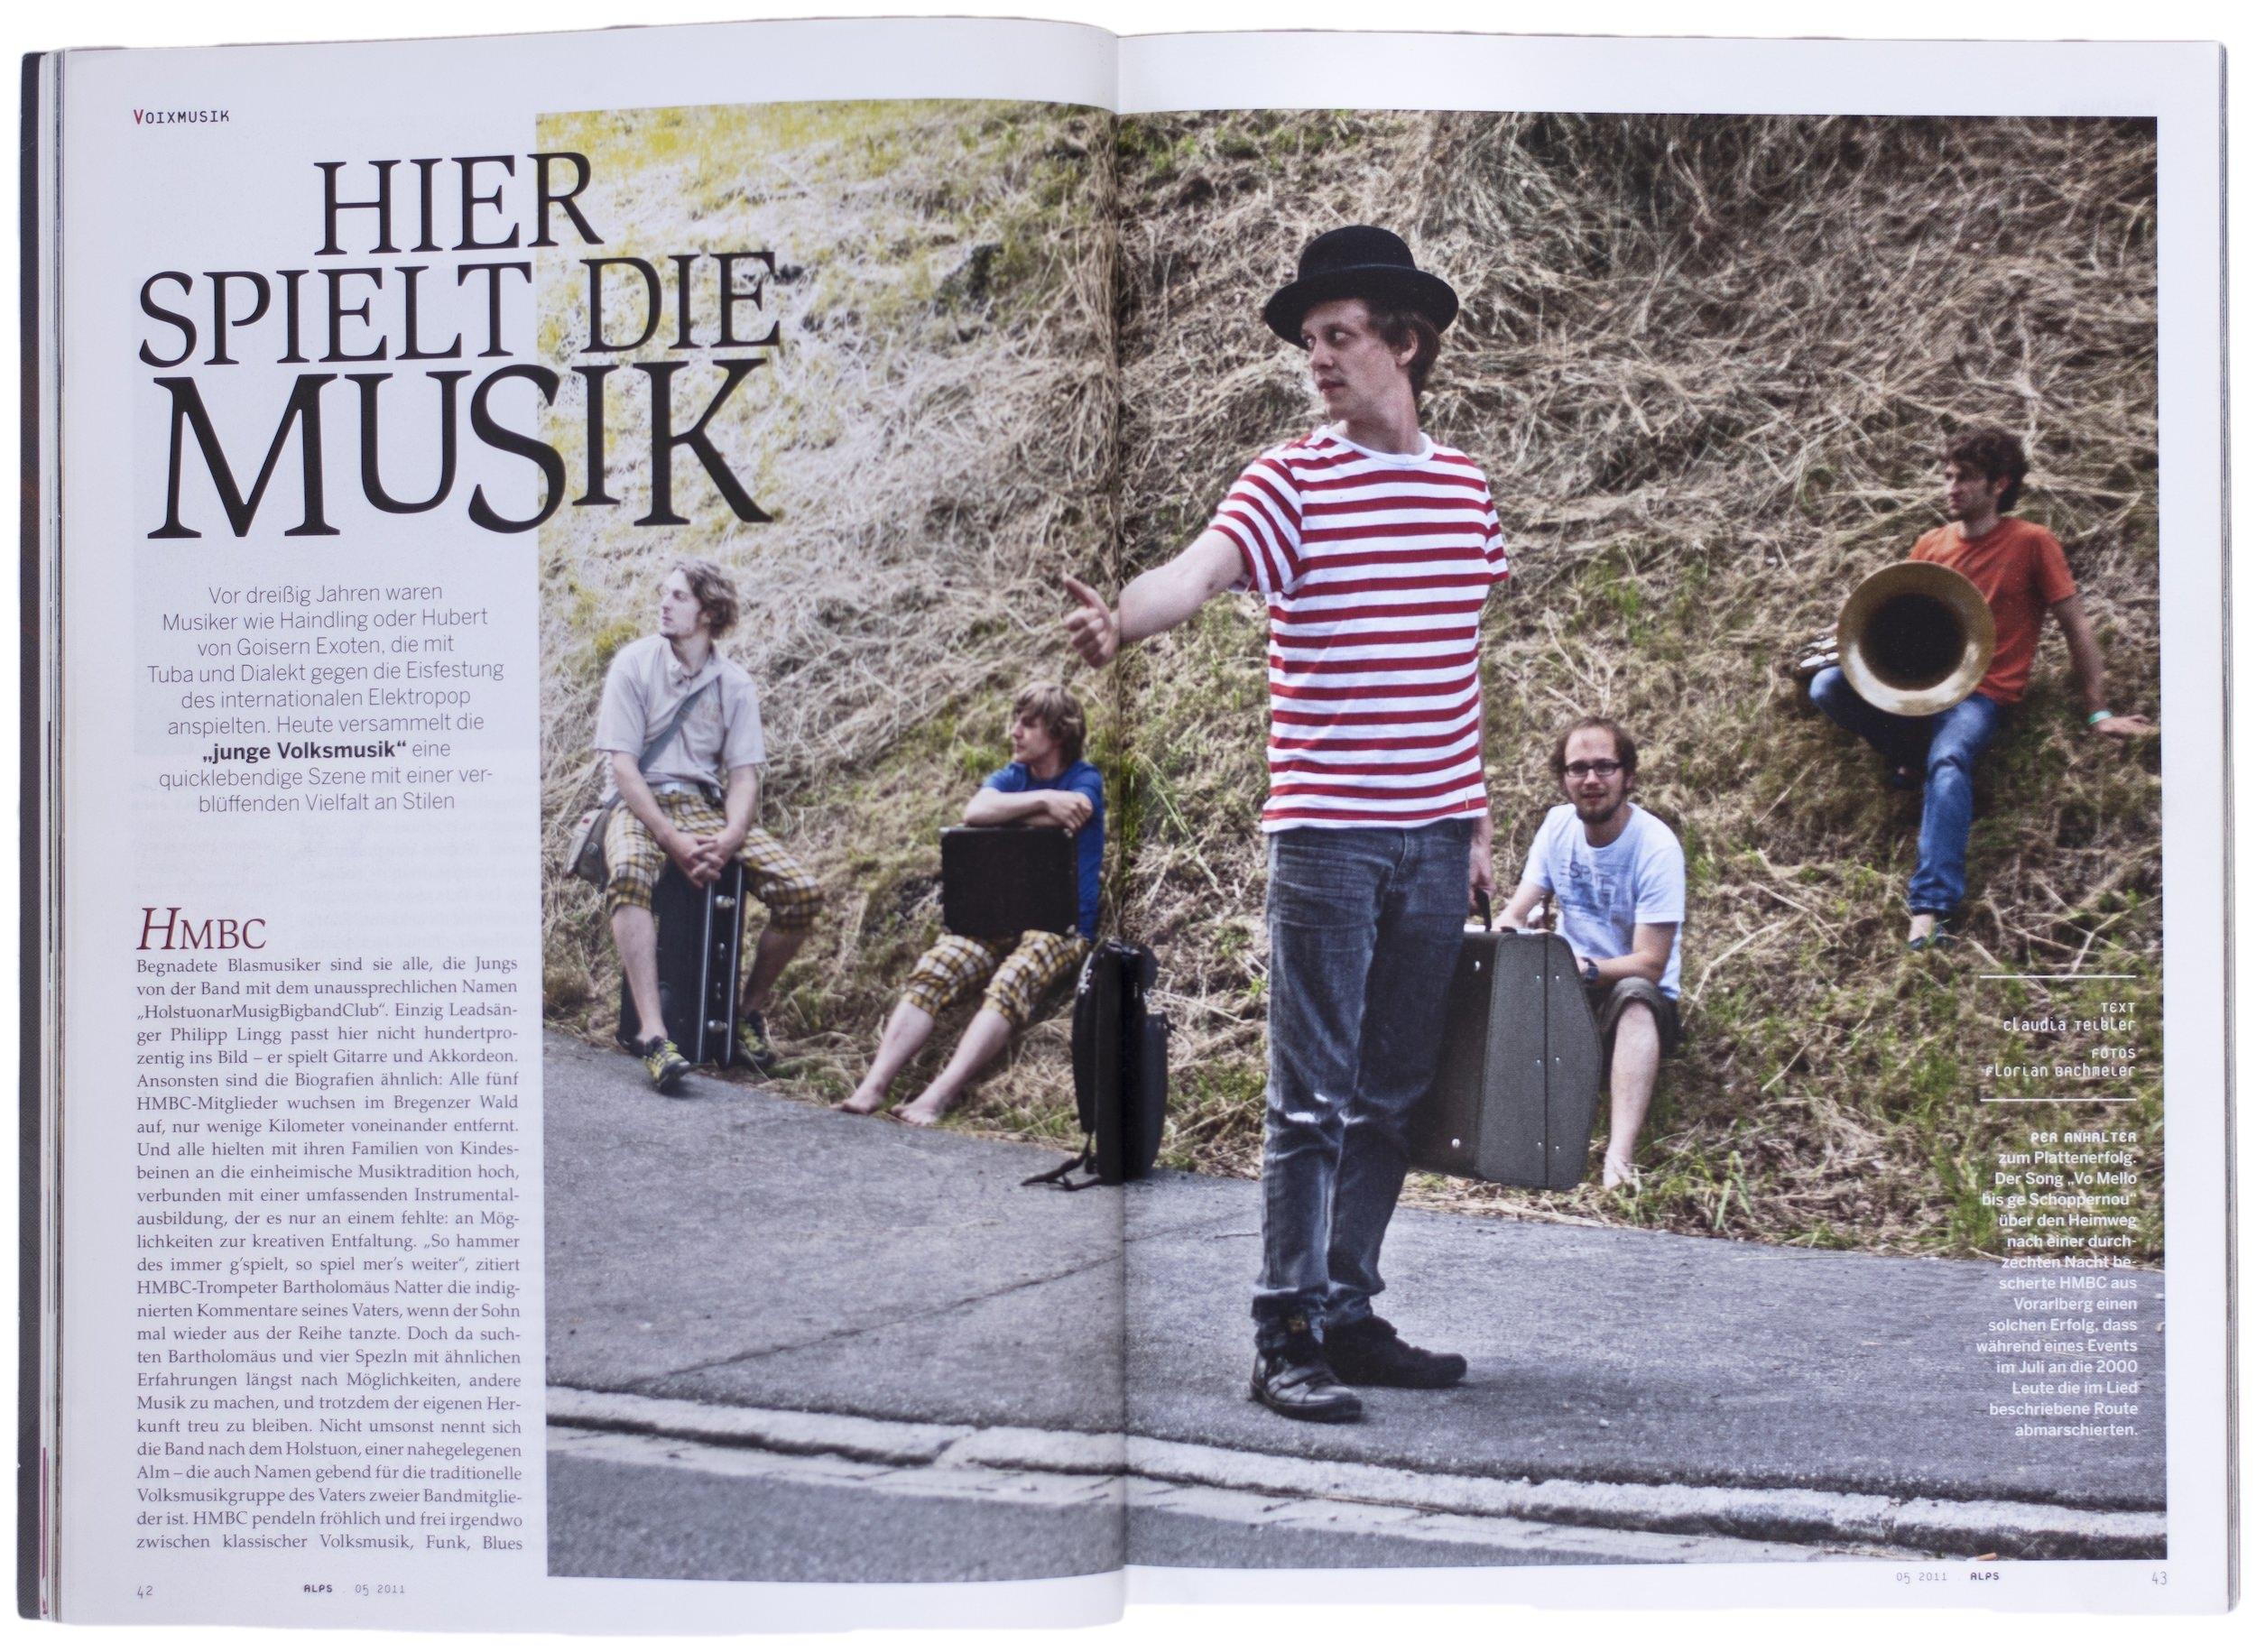 ALPS Magazine, Mai 2011